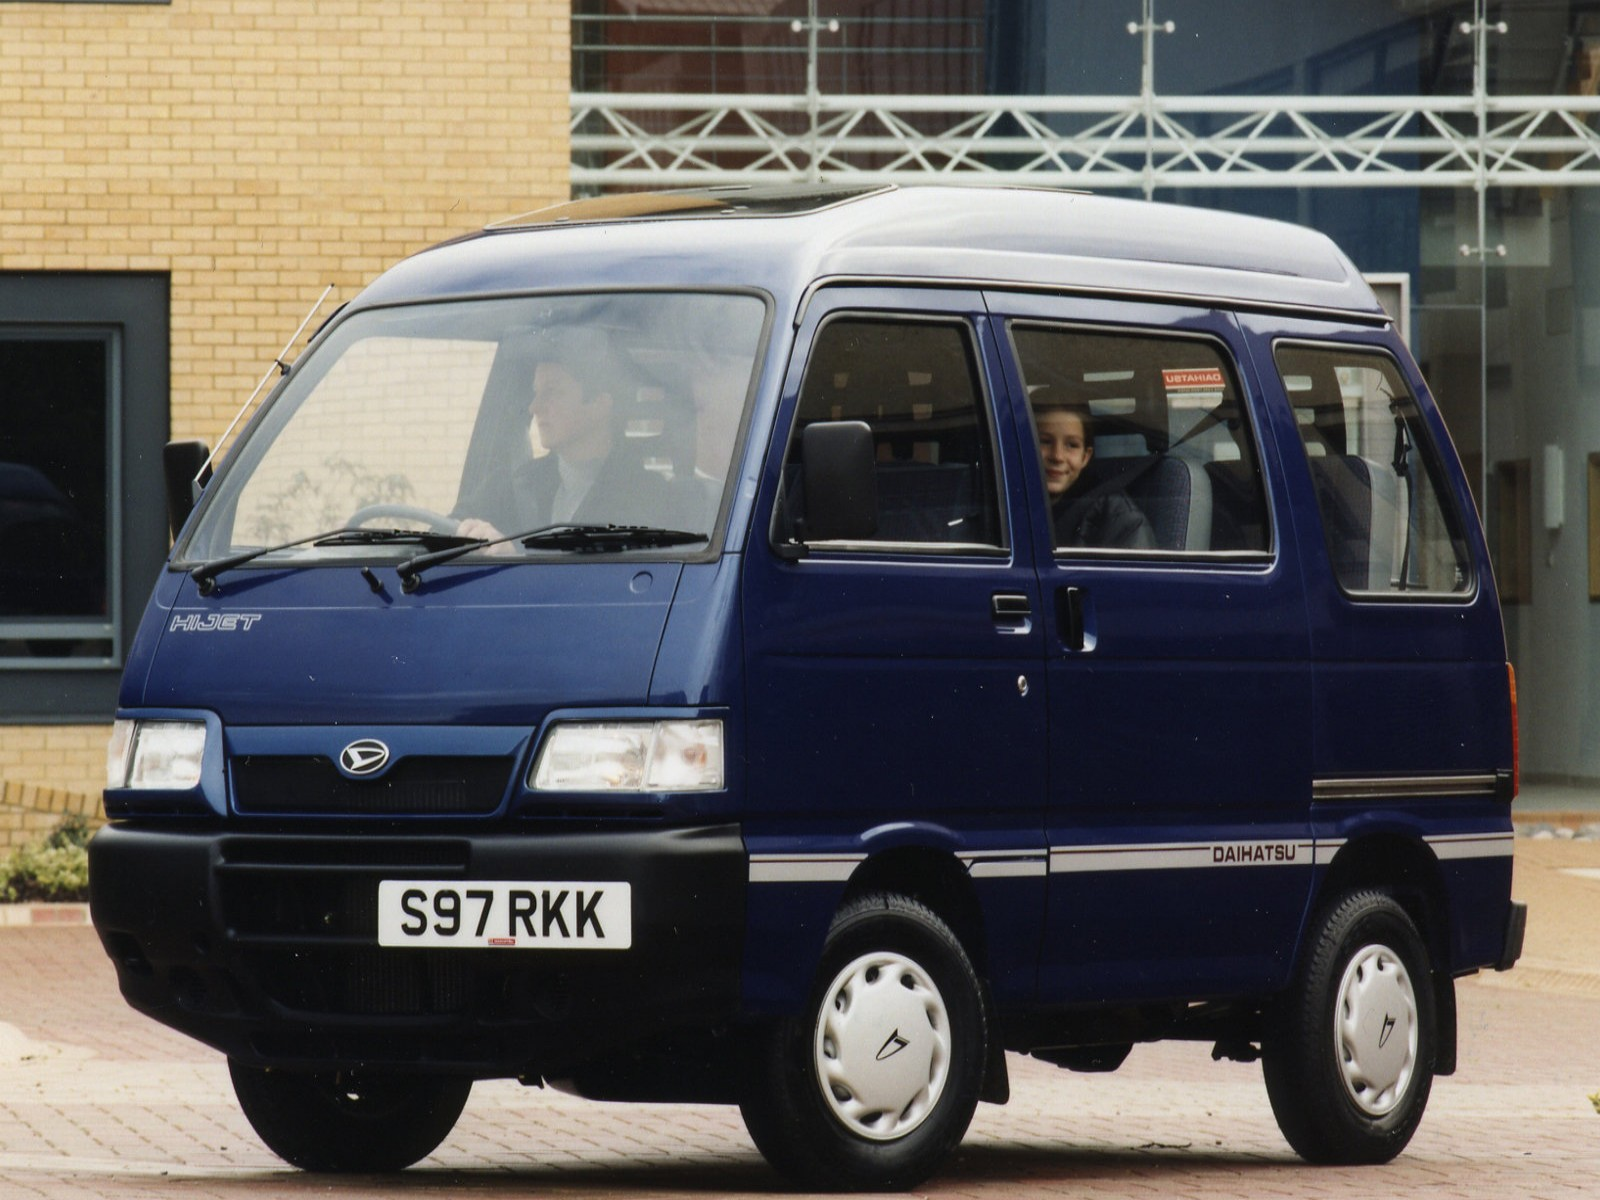 http://2.bp.blogspot.com/-nZW4_ne9KGc/TkAJAlt_oKI/AAAAAAAADo0/ddXJeQf_e5Q/s1600/Daihatsu+Hijet+1997+01.jpg